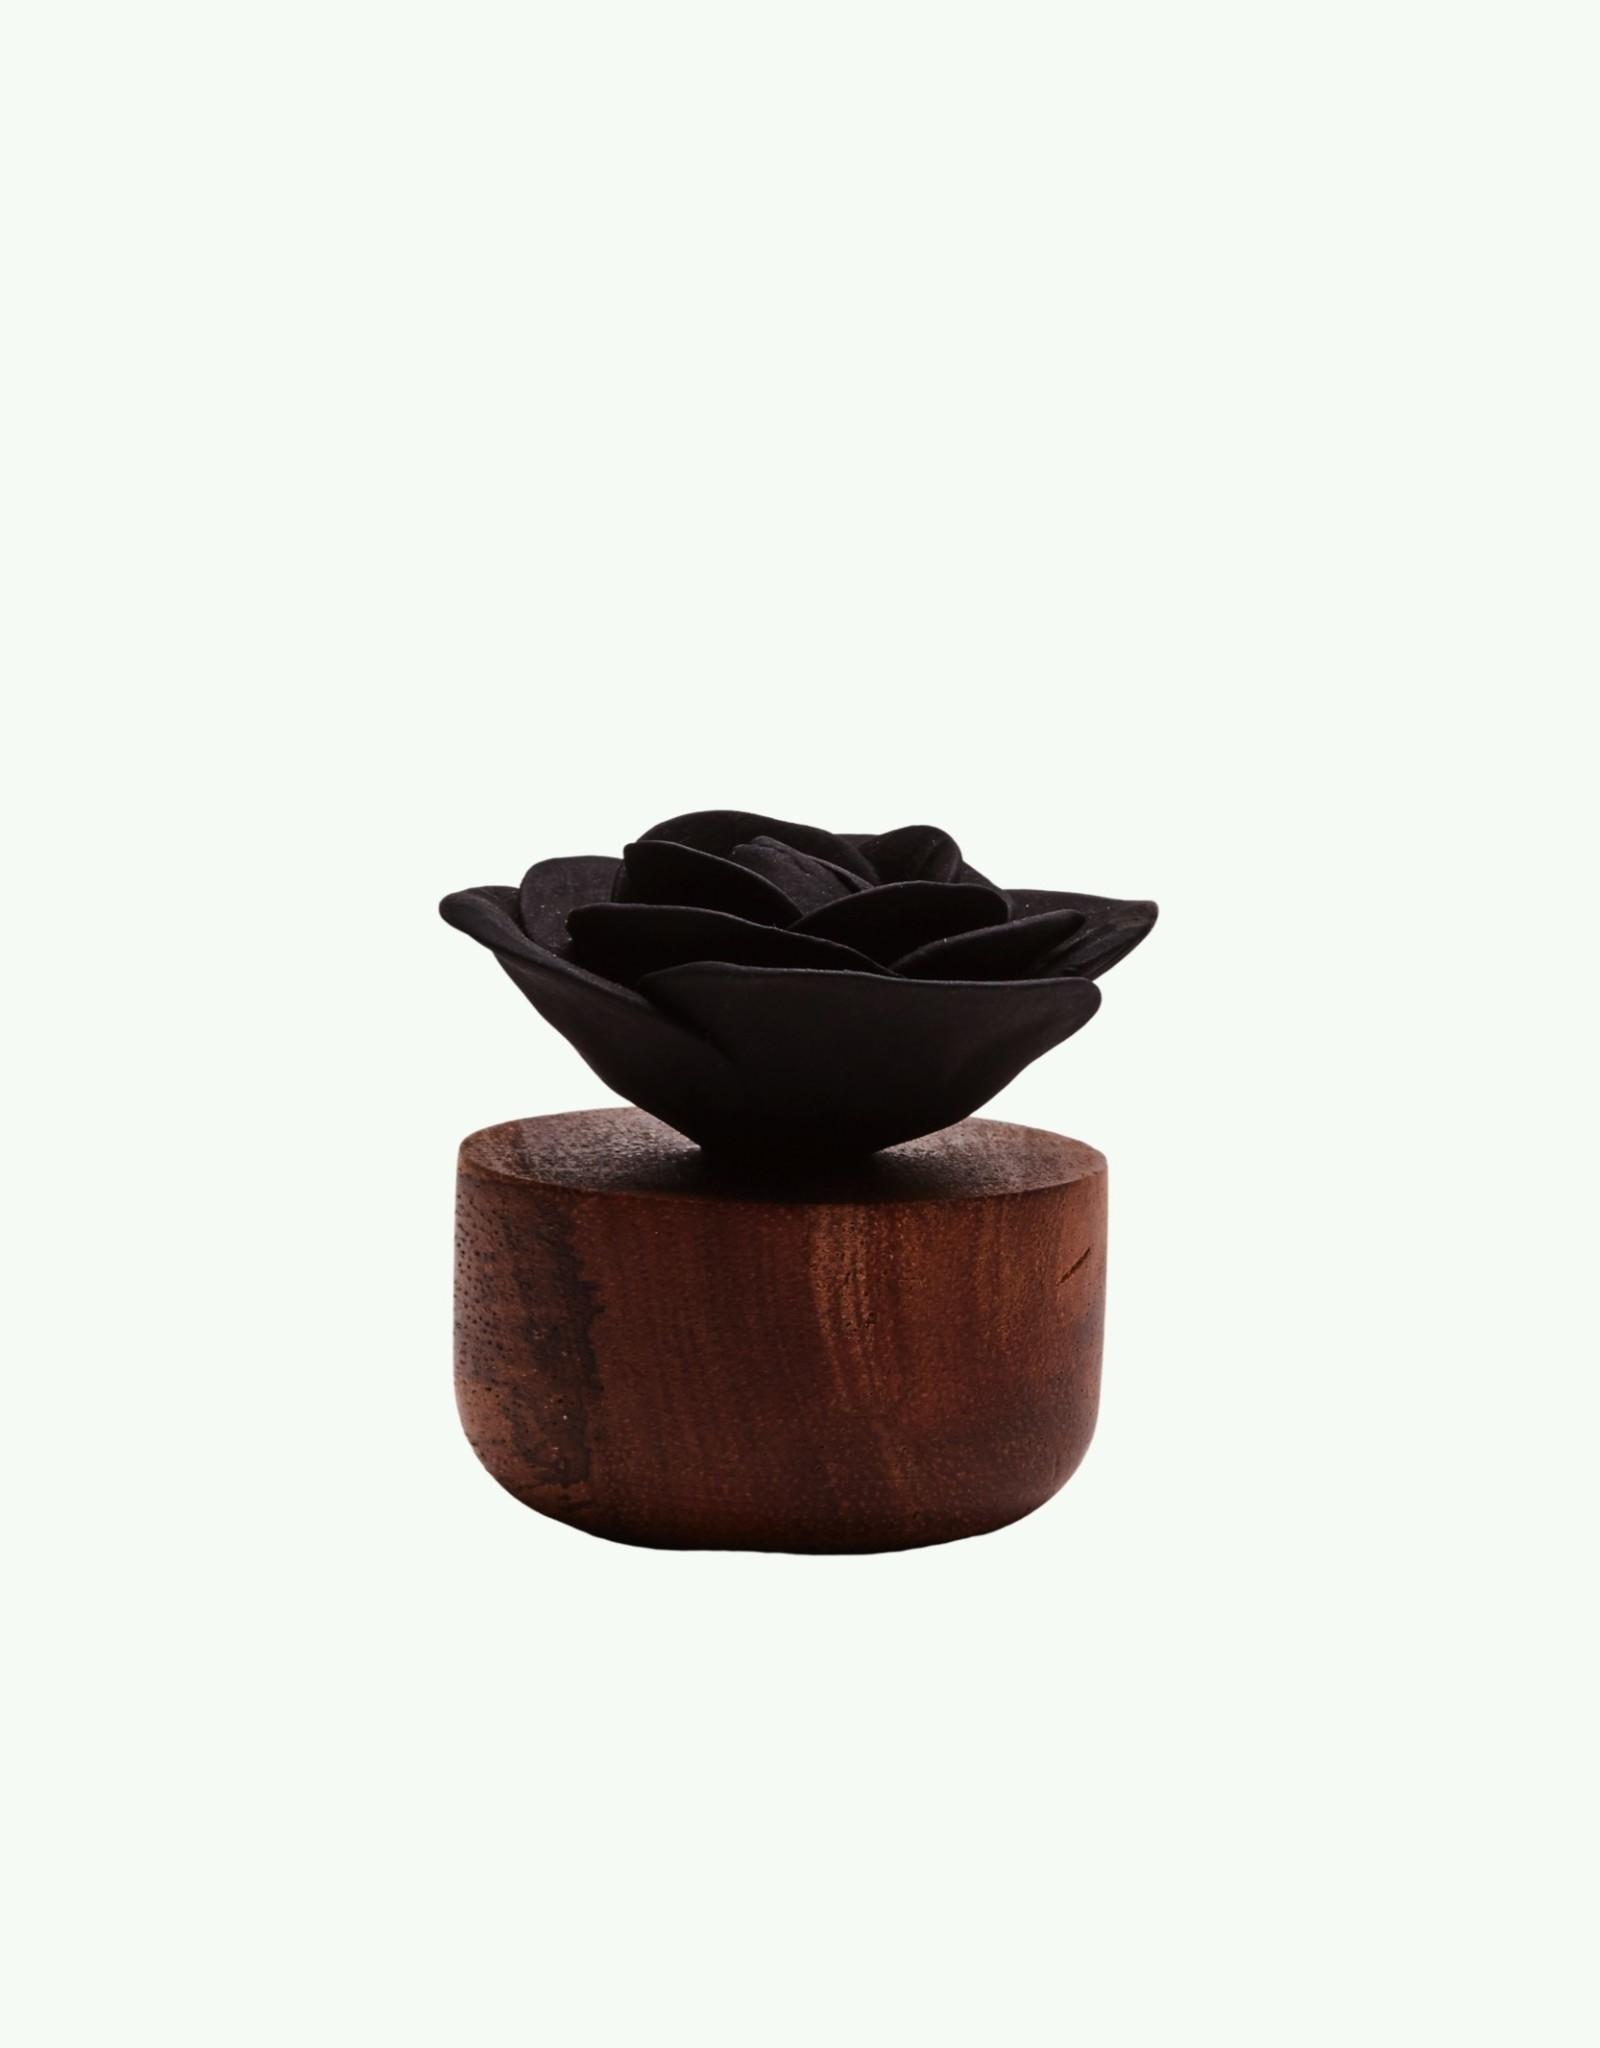 Anoq Anoq - Rose du Bengale - Parfum Diffuser - 2 kleuren